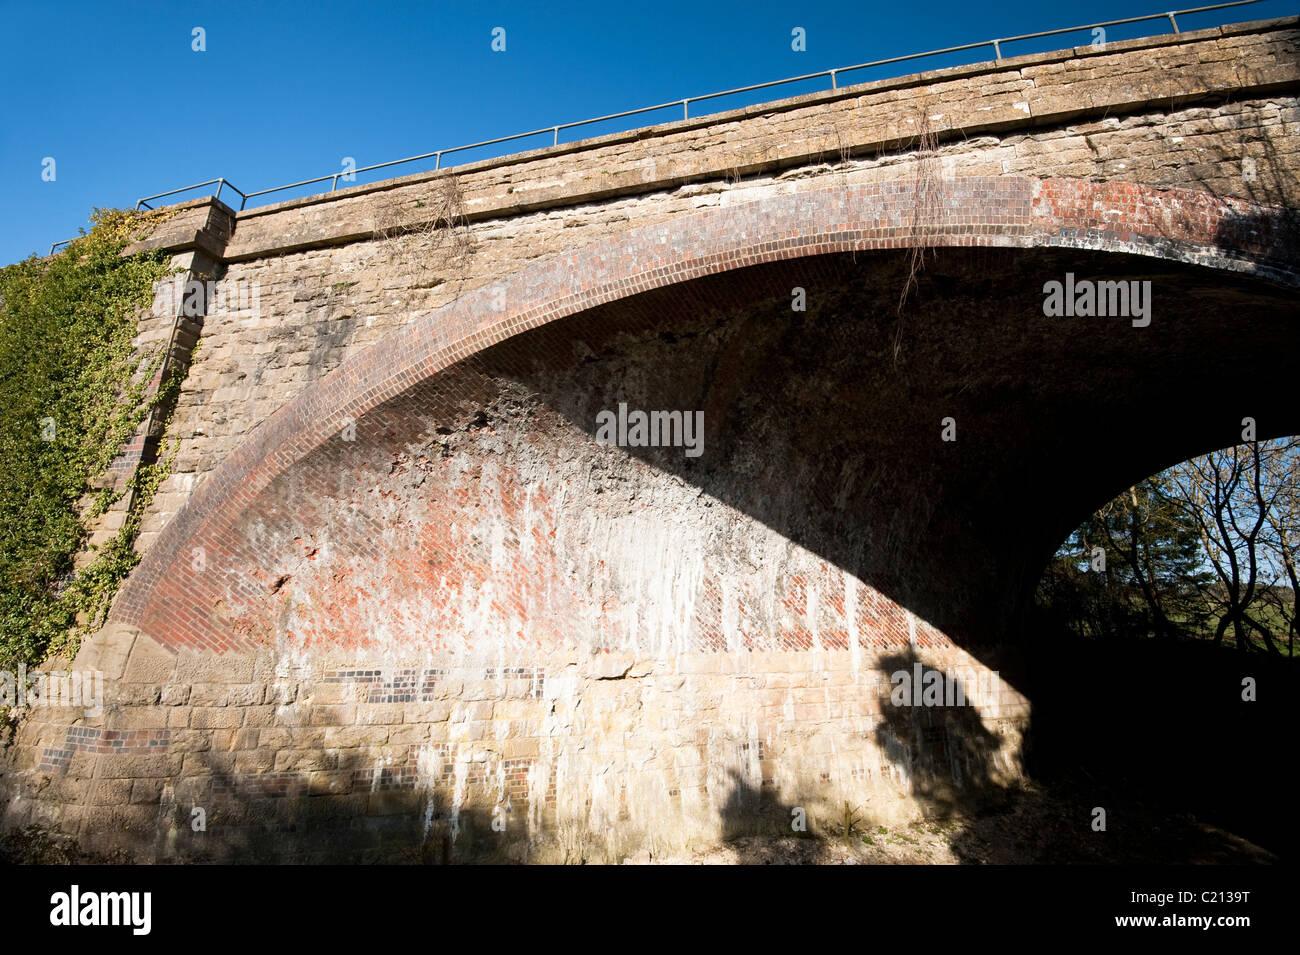 Swindon - Gloucester Skew Railway Bridge across the Thames and Severn Canal, Gloucestershire, England, United Kingdom - Stock Image